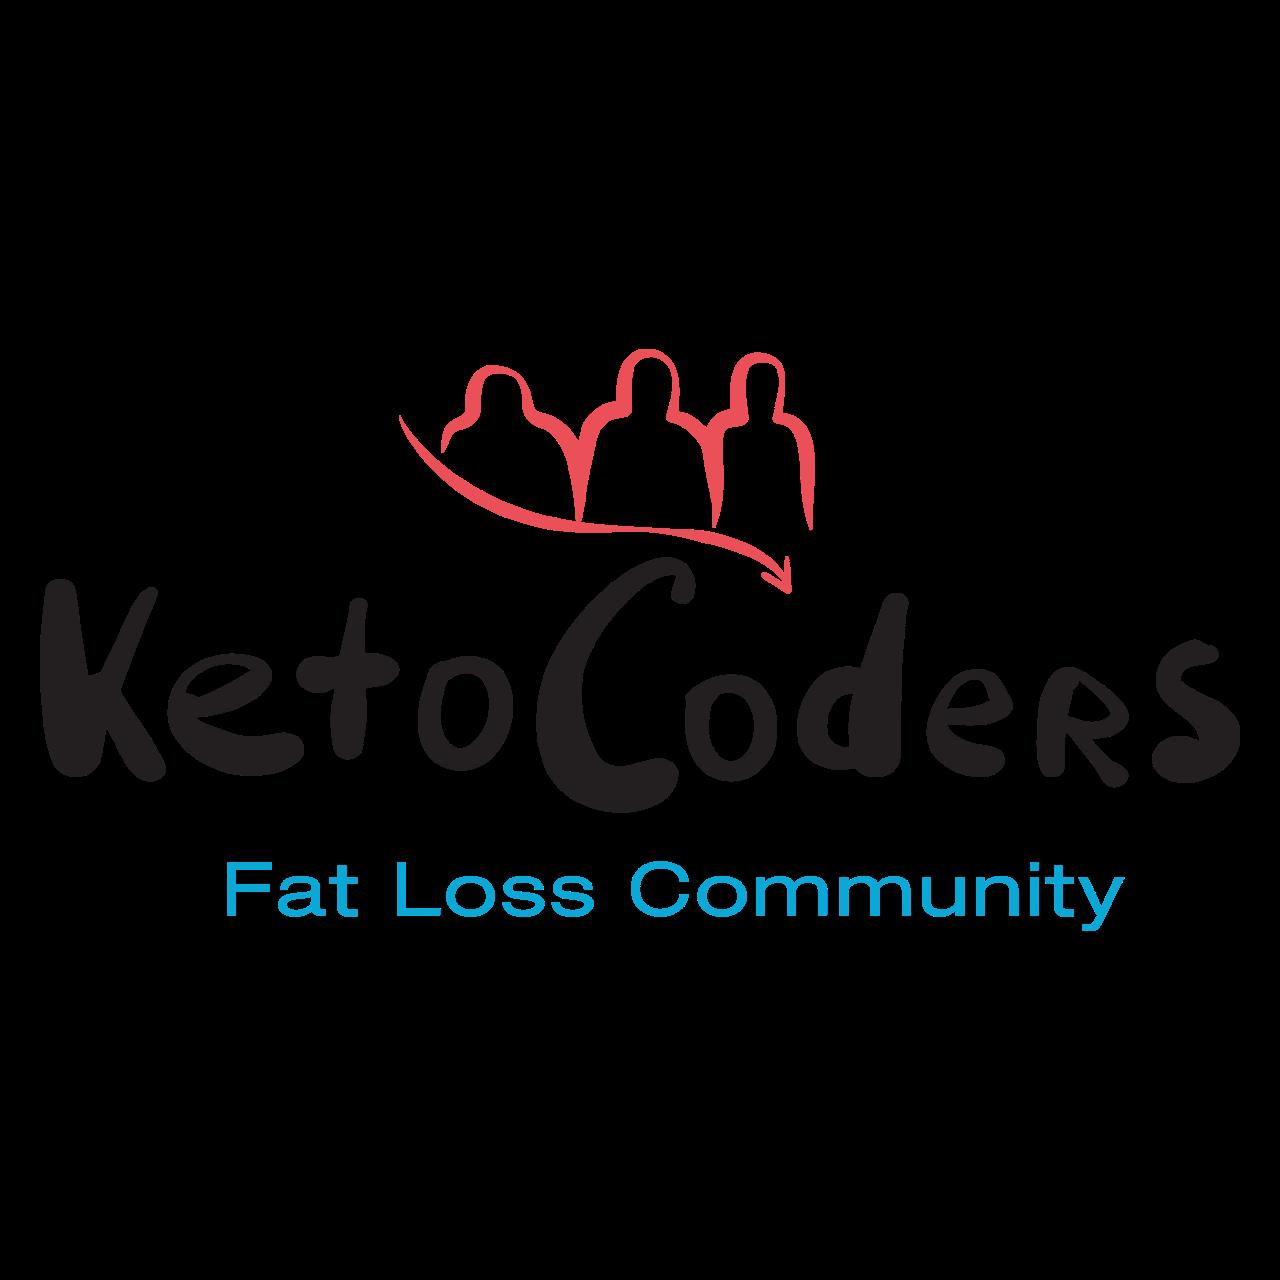 KetoCoders Community